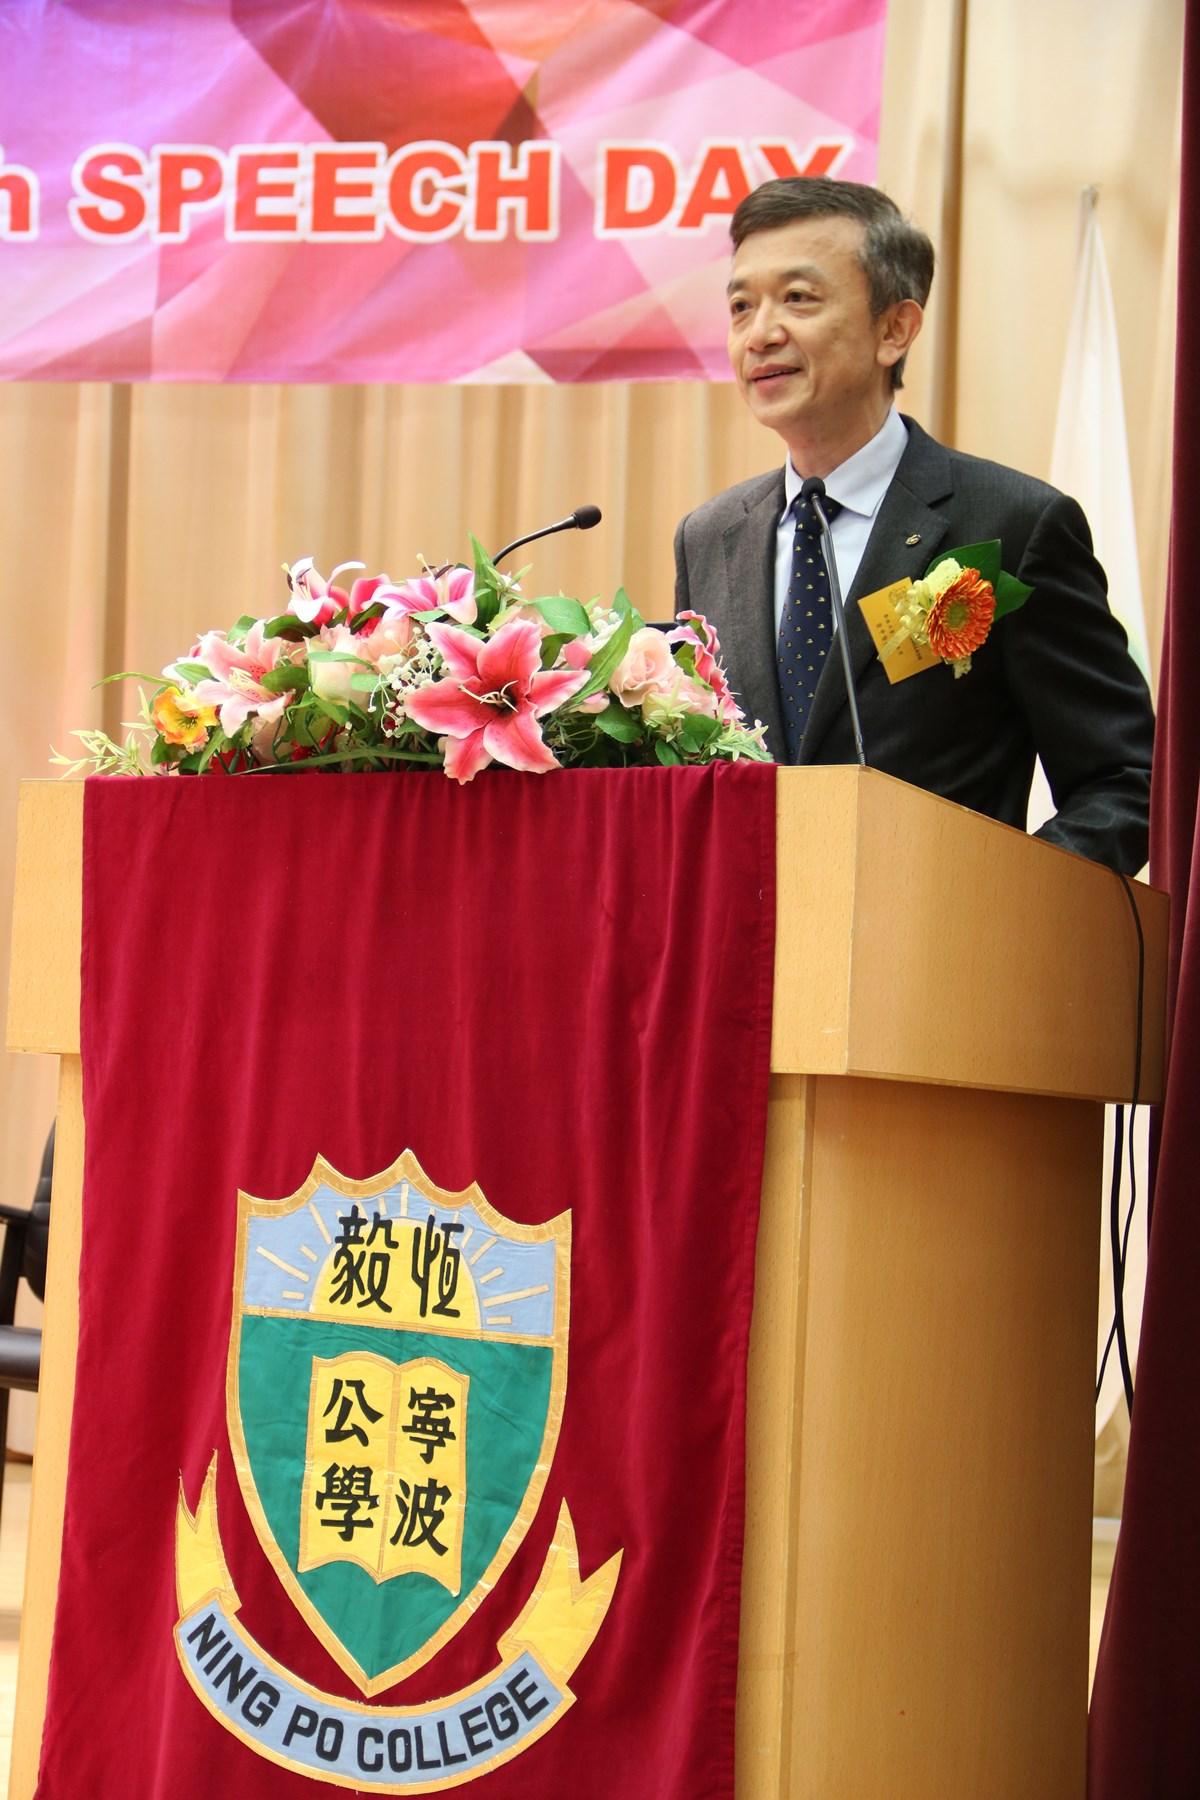 https://npc.edu.hk/sites/default/files/12_img_7035.jpg